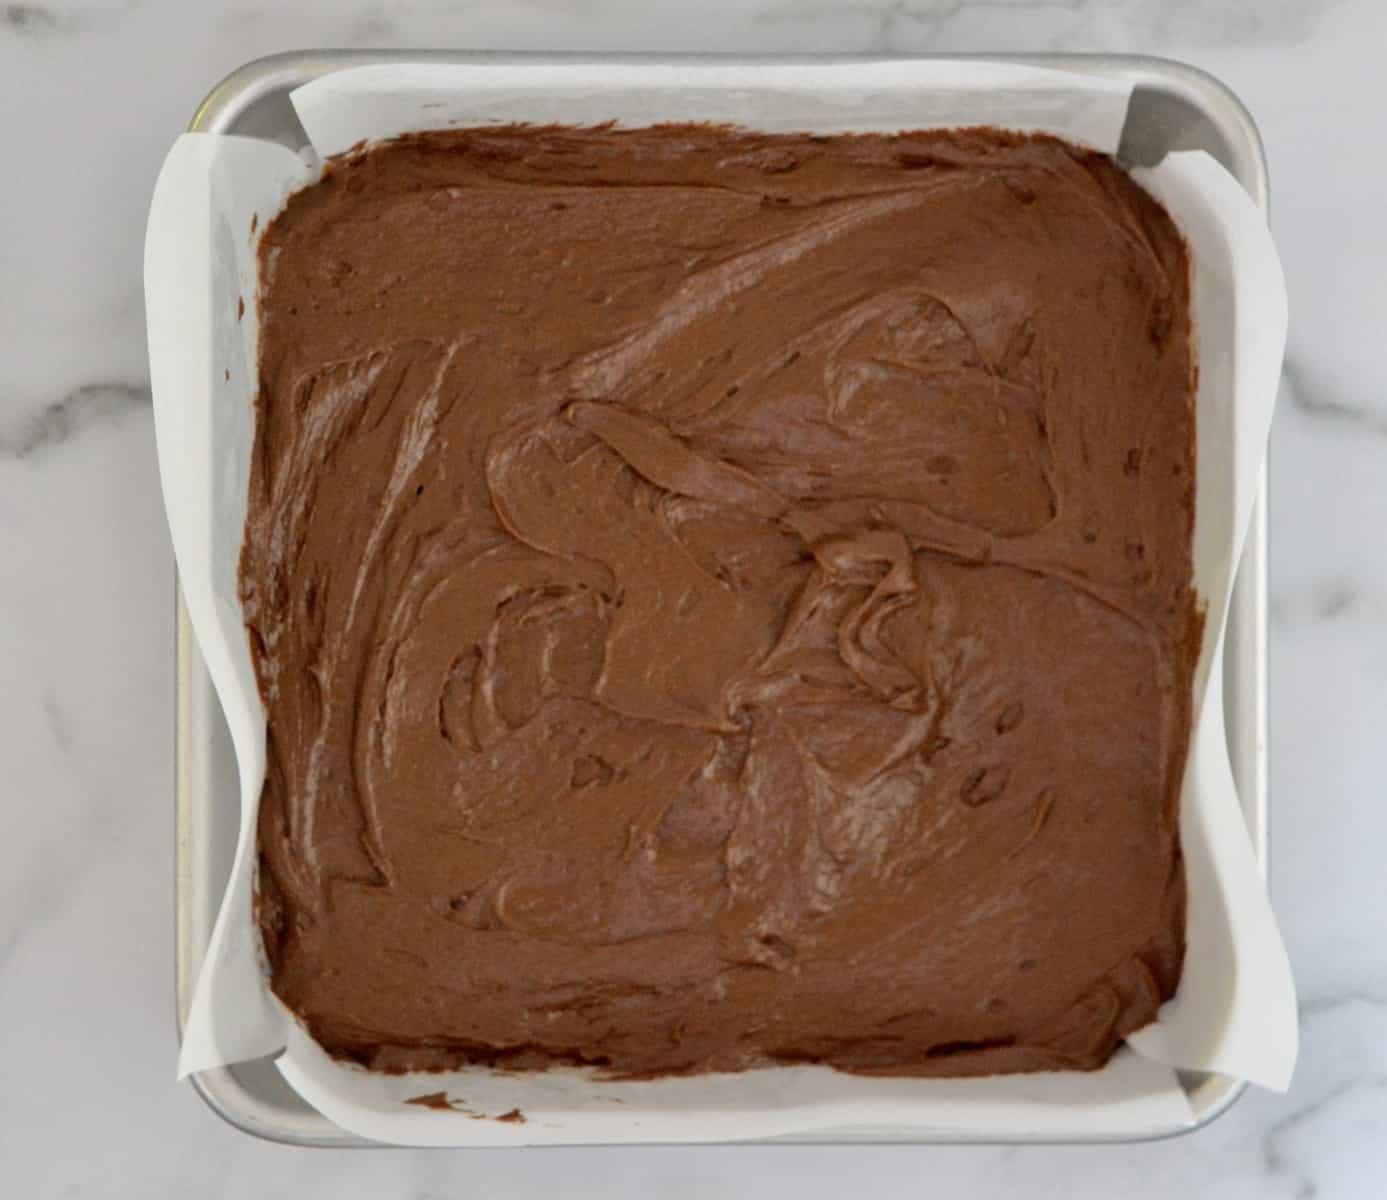 brownie batter in a pan for best Reese's brownies